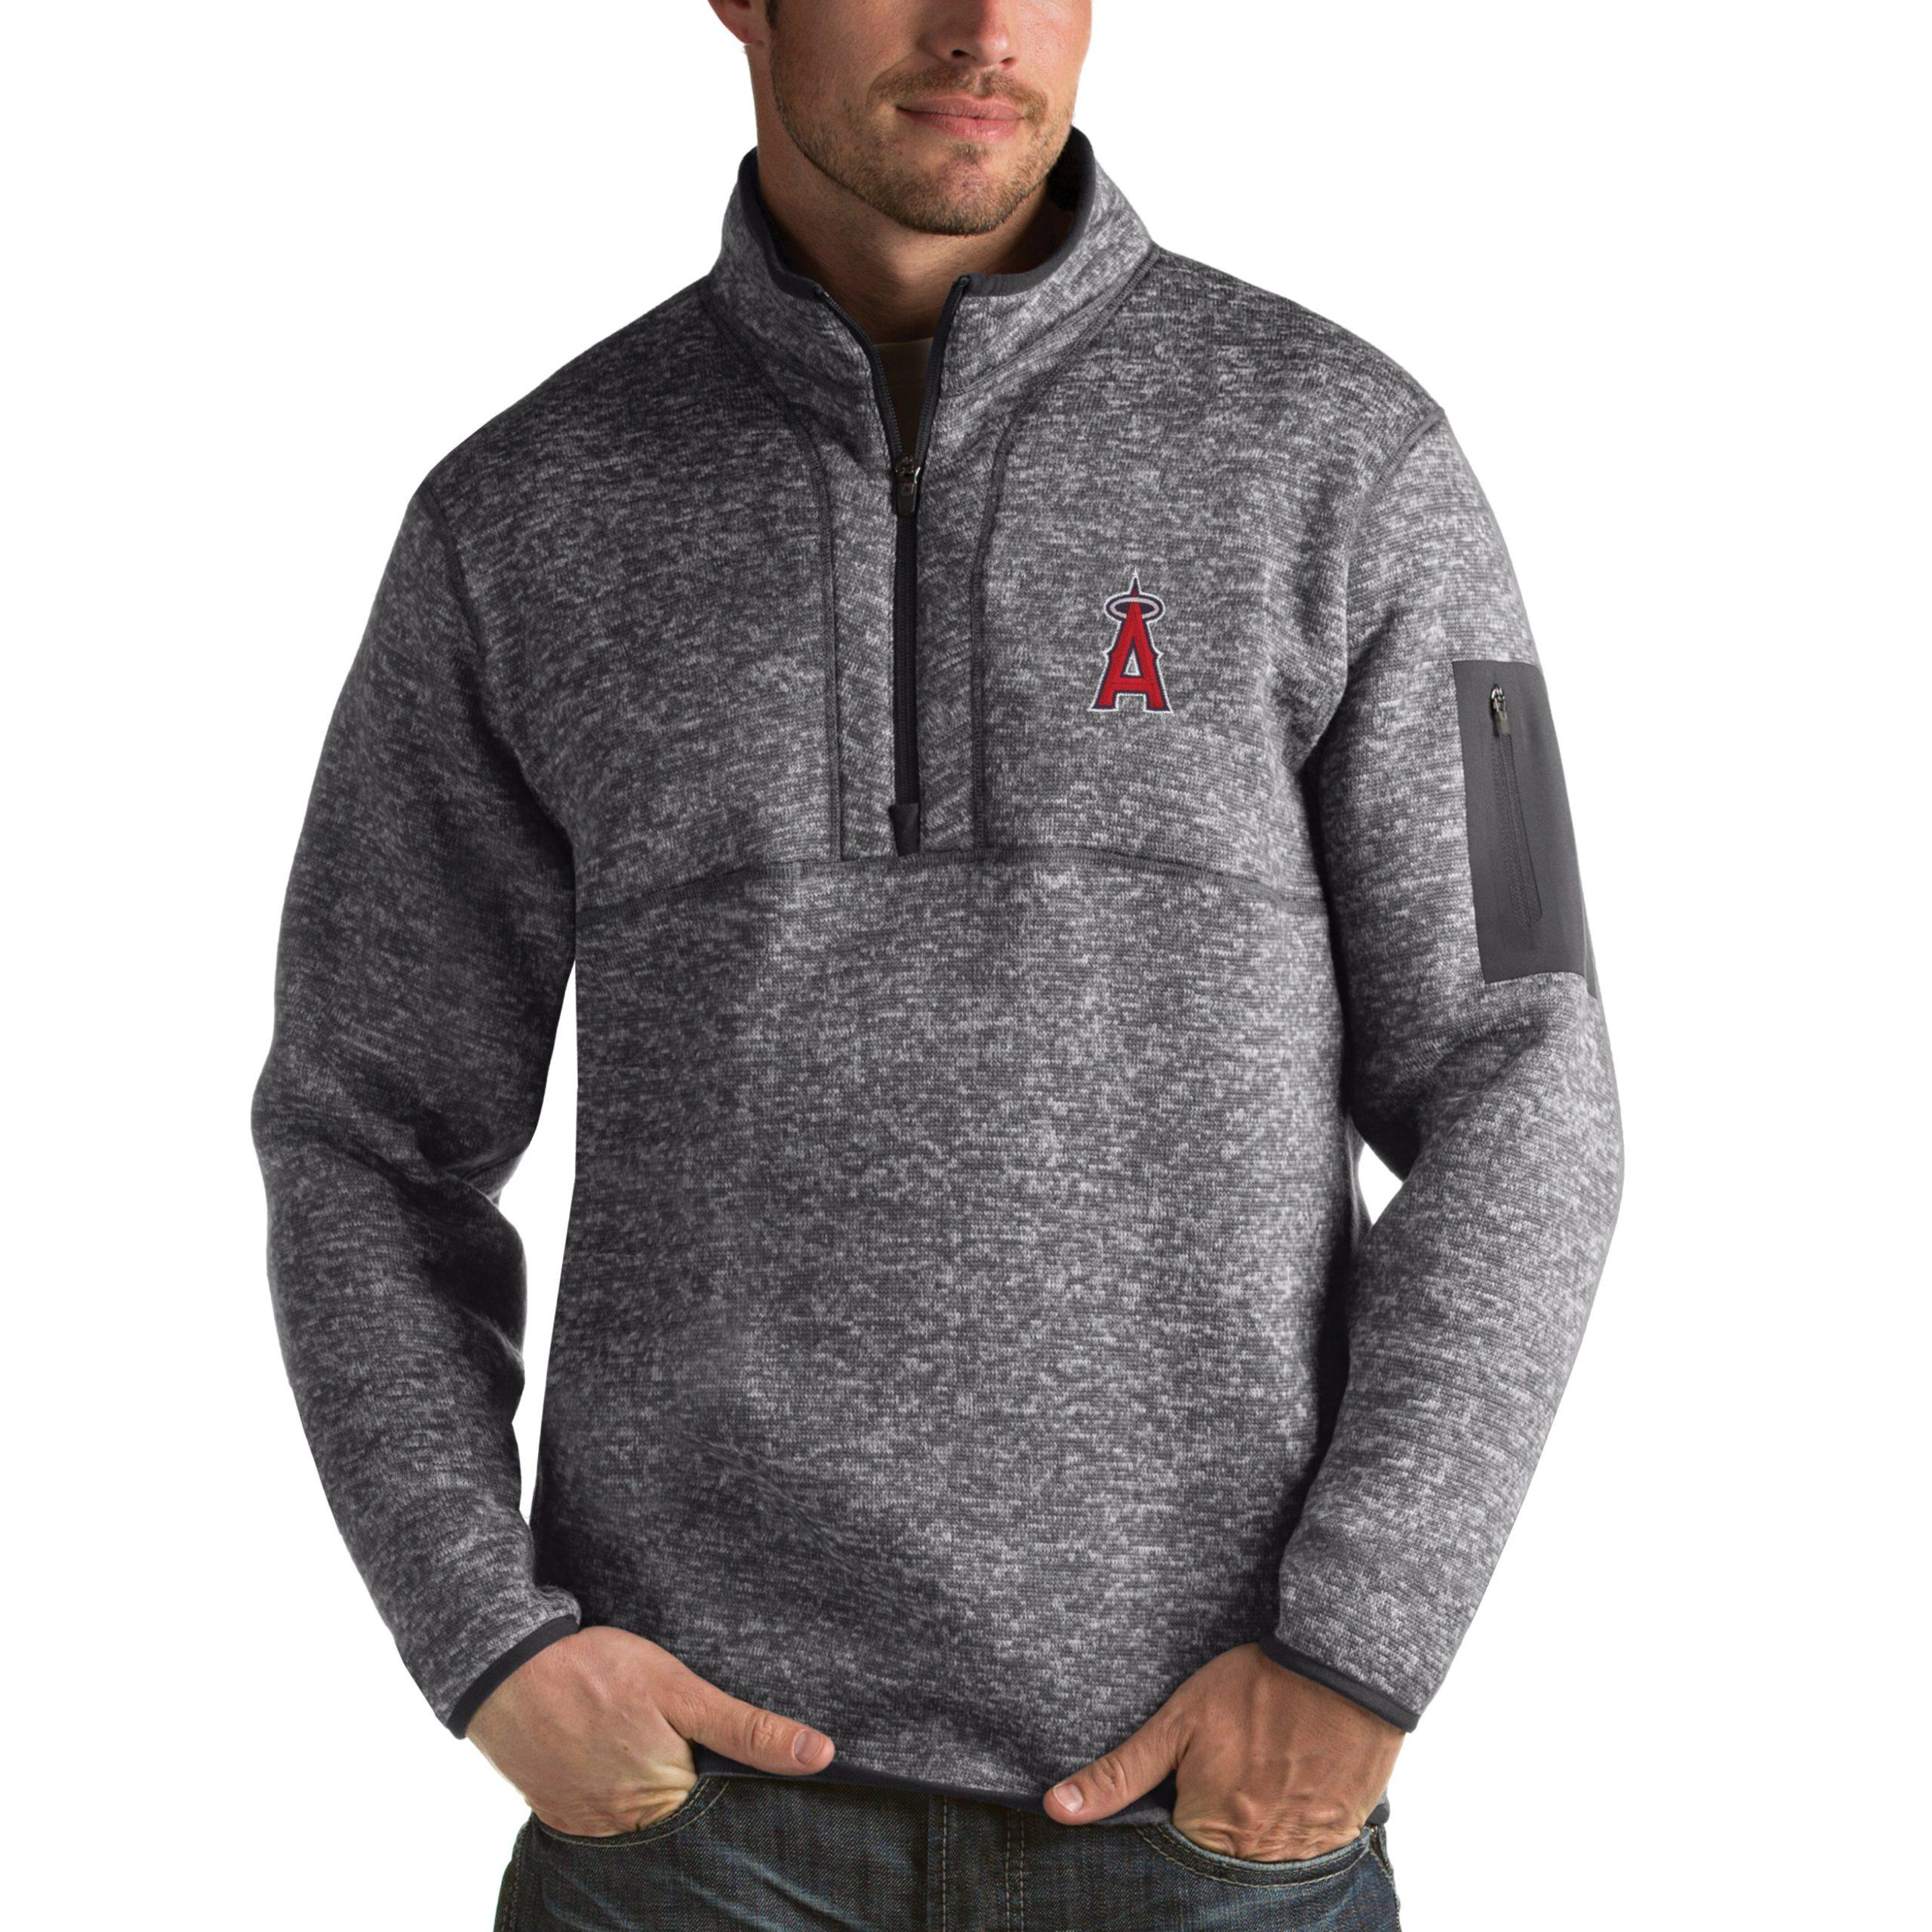 Los Angeles Angels Antigua Fortune Half-Zip Sweater - Heathered Charcoal